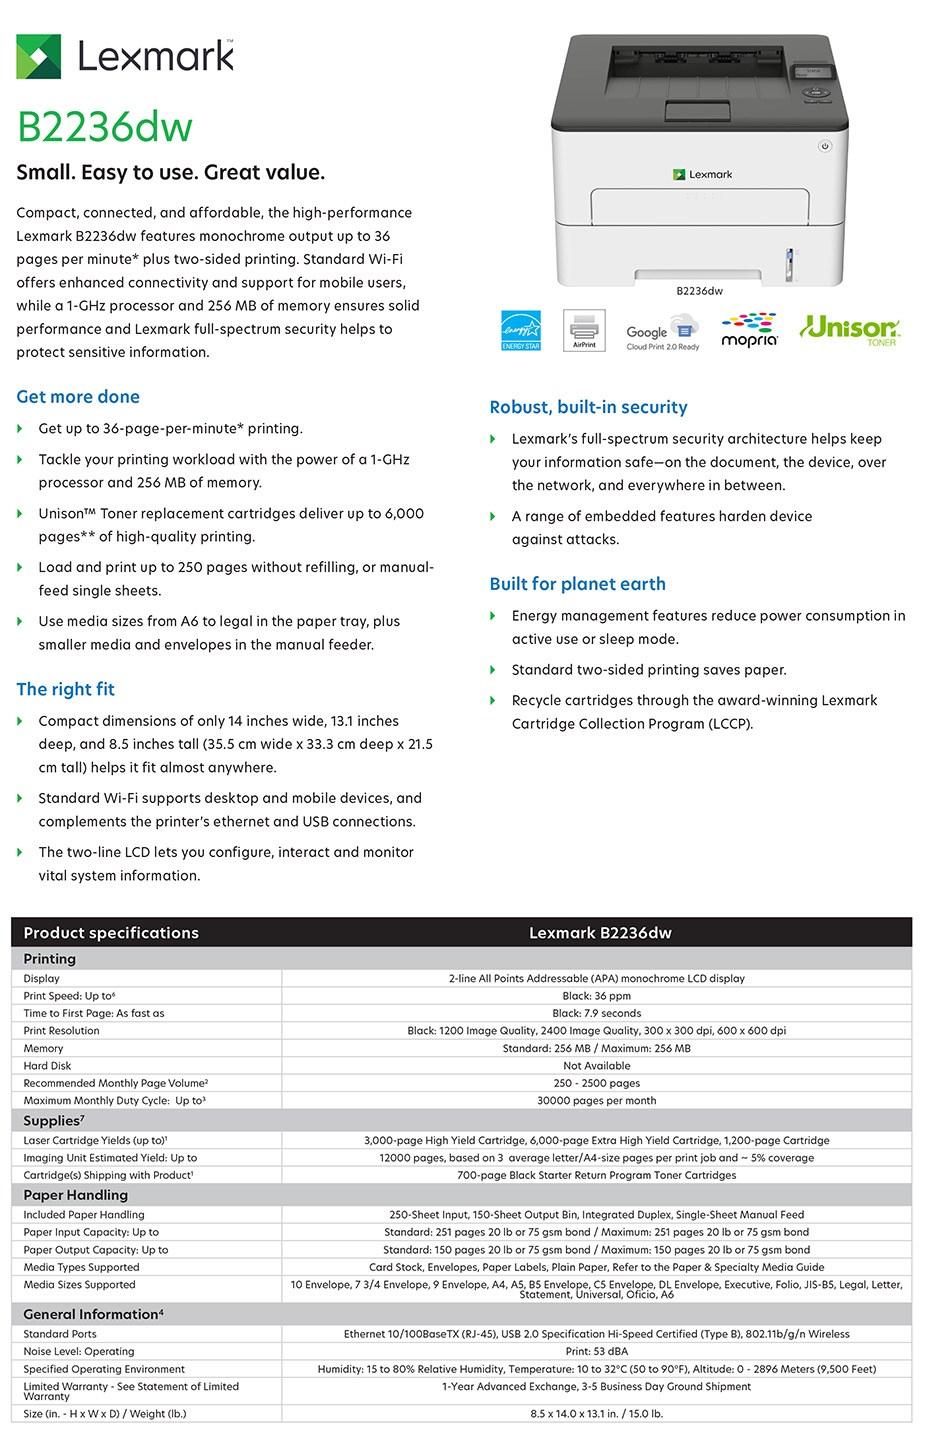 Lexmark B2236dw A4 Monochrome Multifunction Wireless Laser Printer - Overview 1